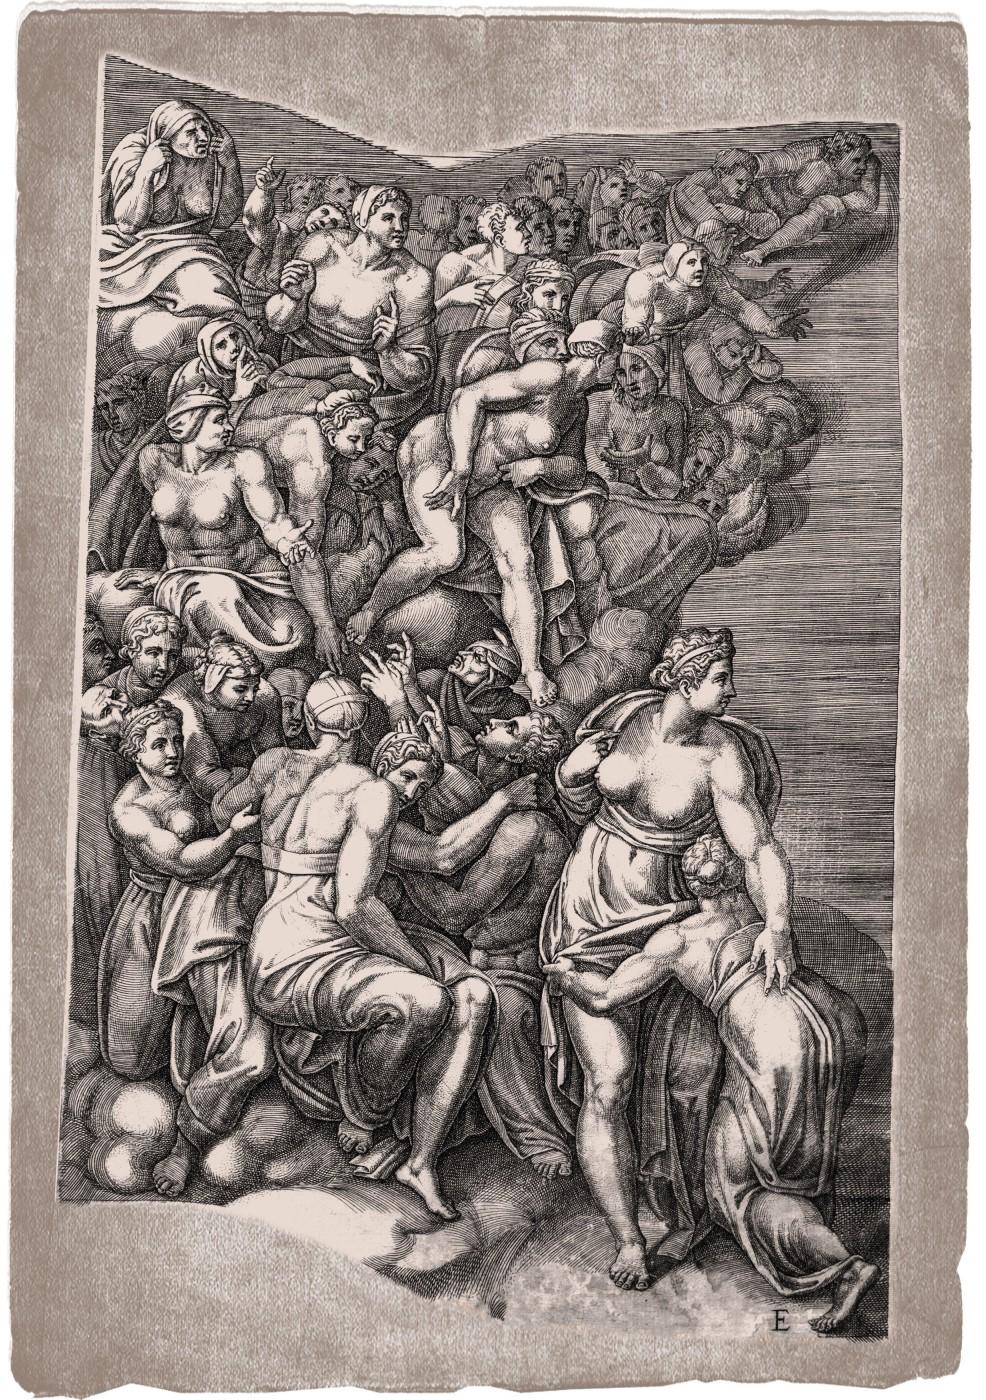 The Last Judgment. 1650. (Sheet E.)